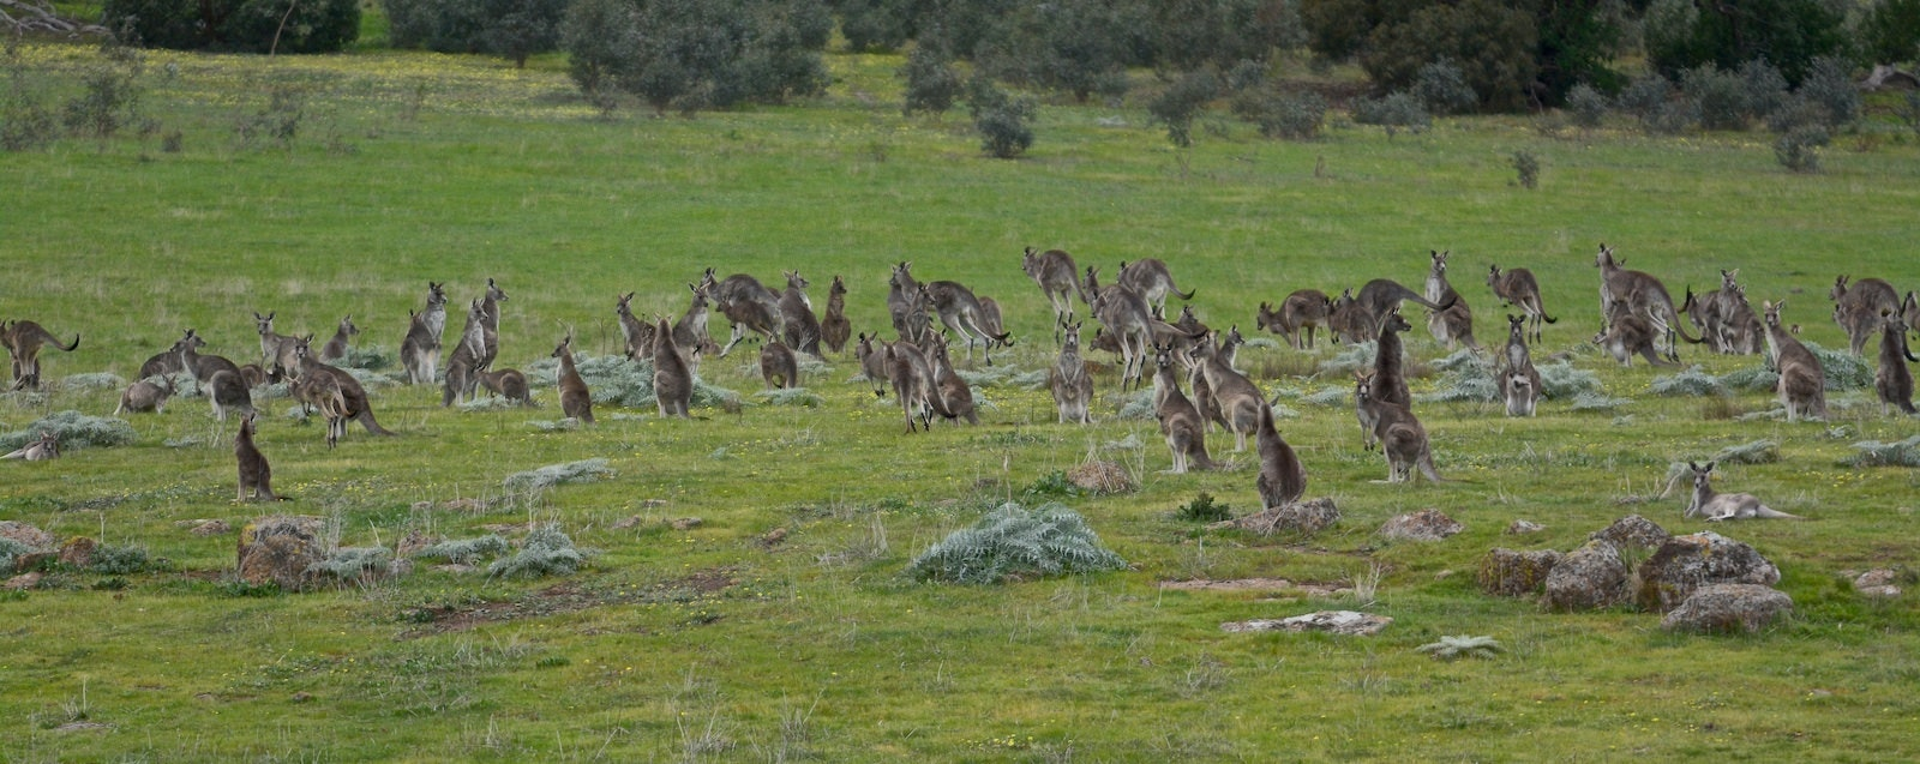 culling kangaroos essay